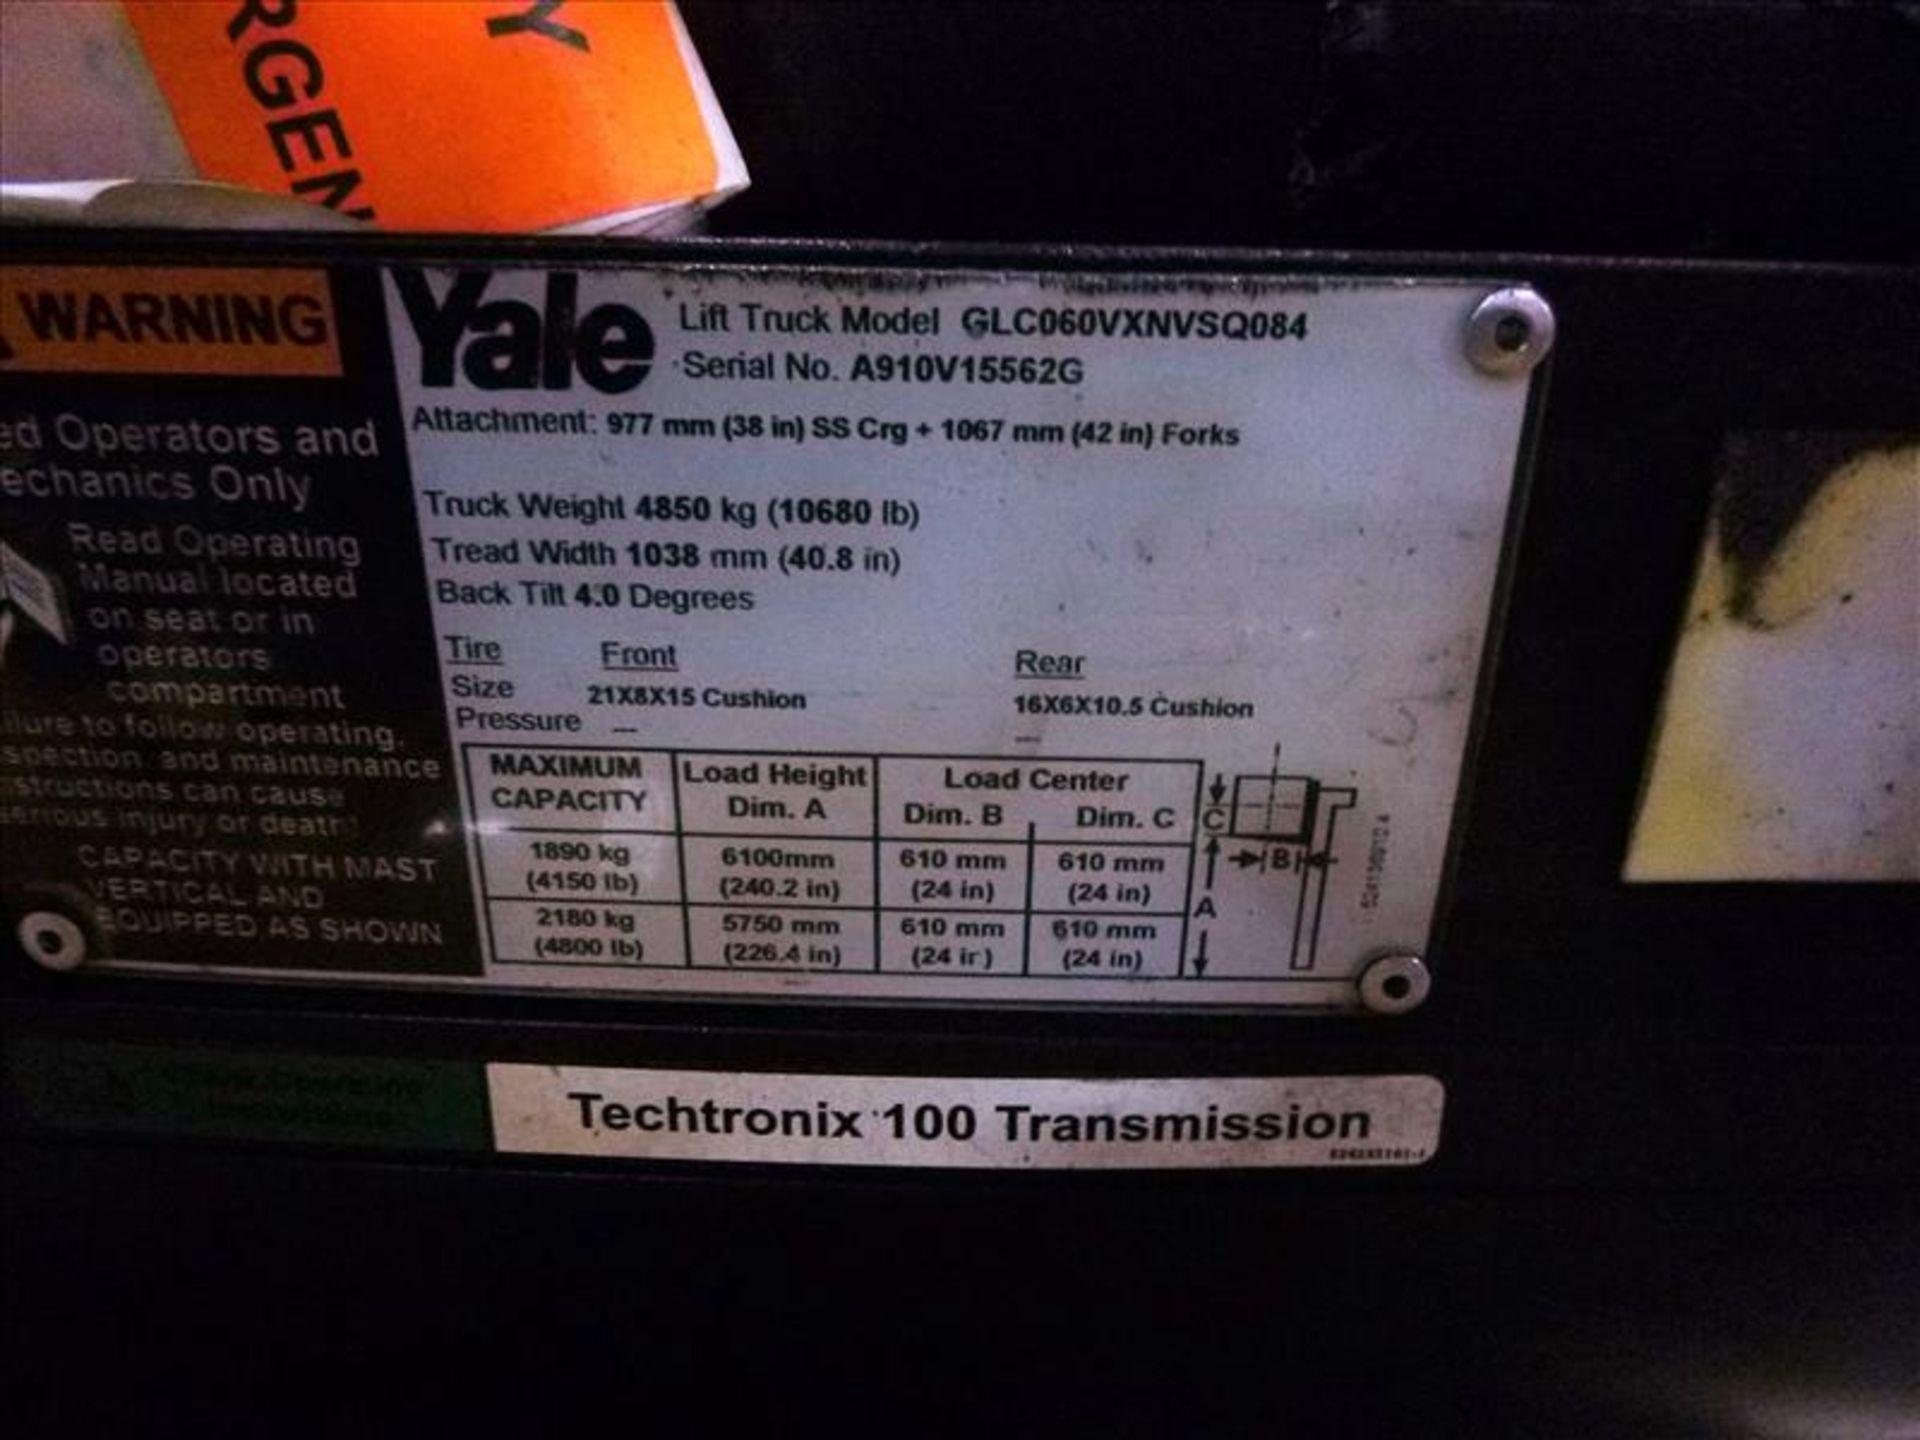 Yale fork lift truck, mod. GLC060VXNVSQ084, ser. no. A91V15562G, LPG, 4000 lbs cap., 240 in. lift - Image 4 of 4